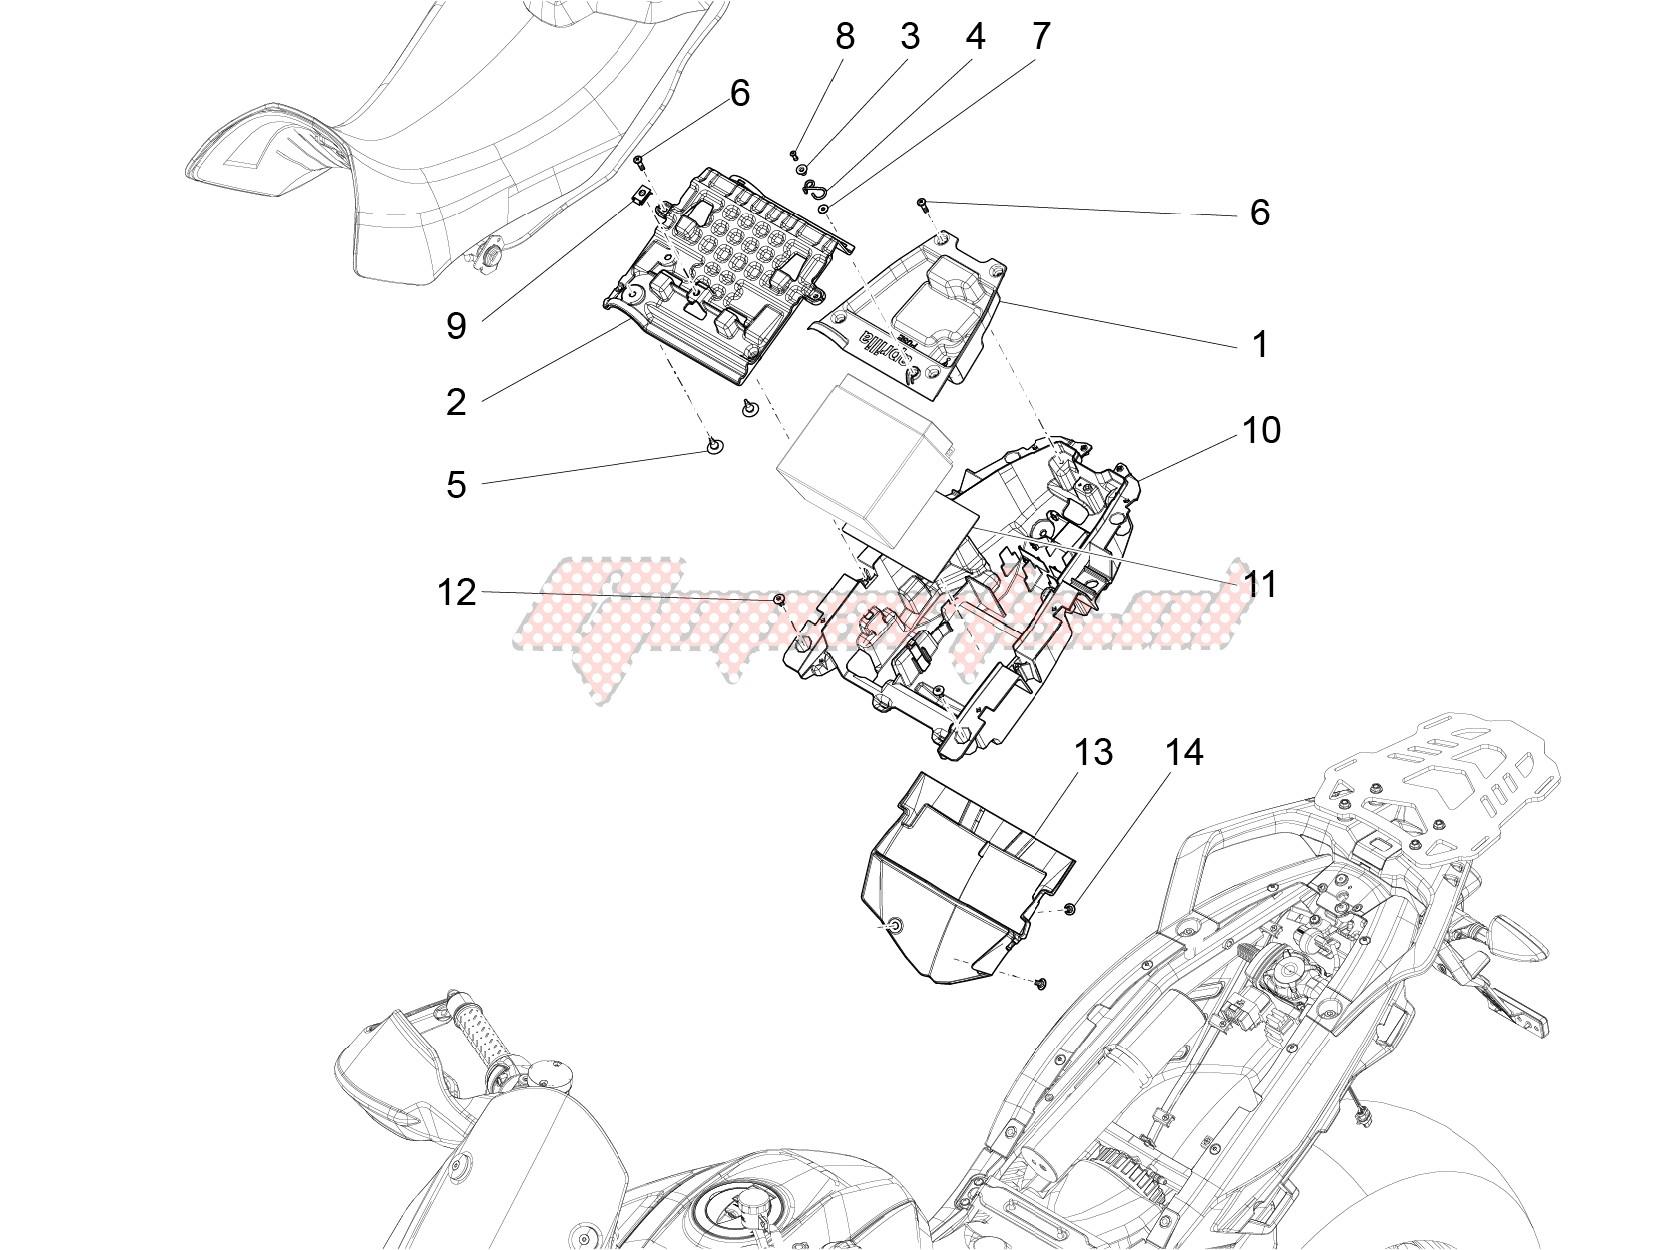 Saddle compartment image